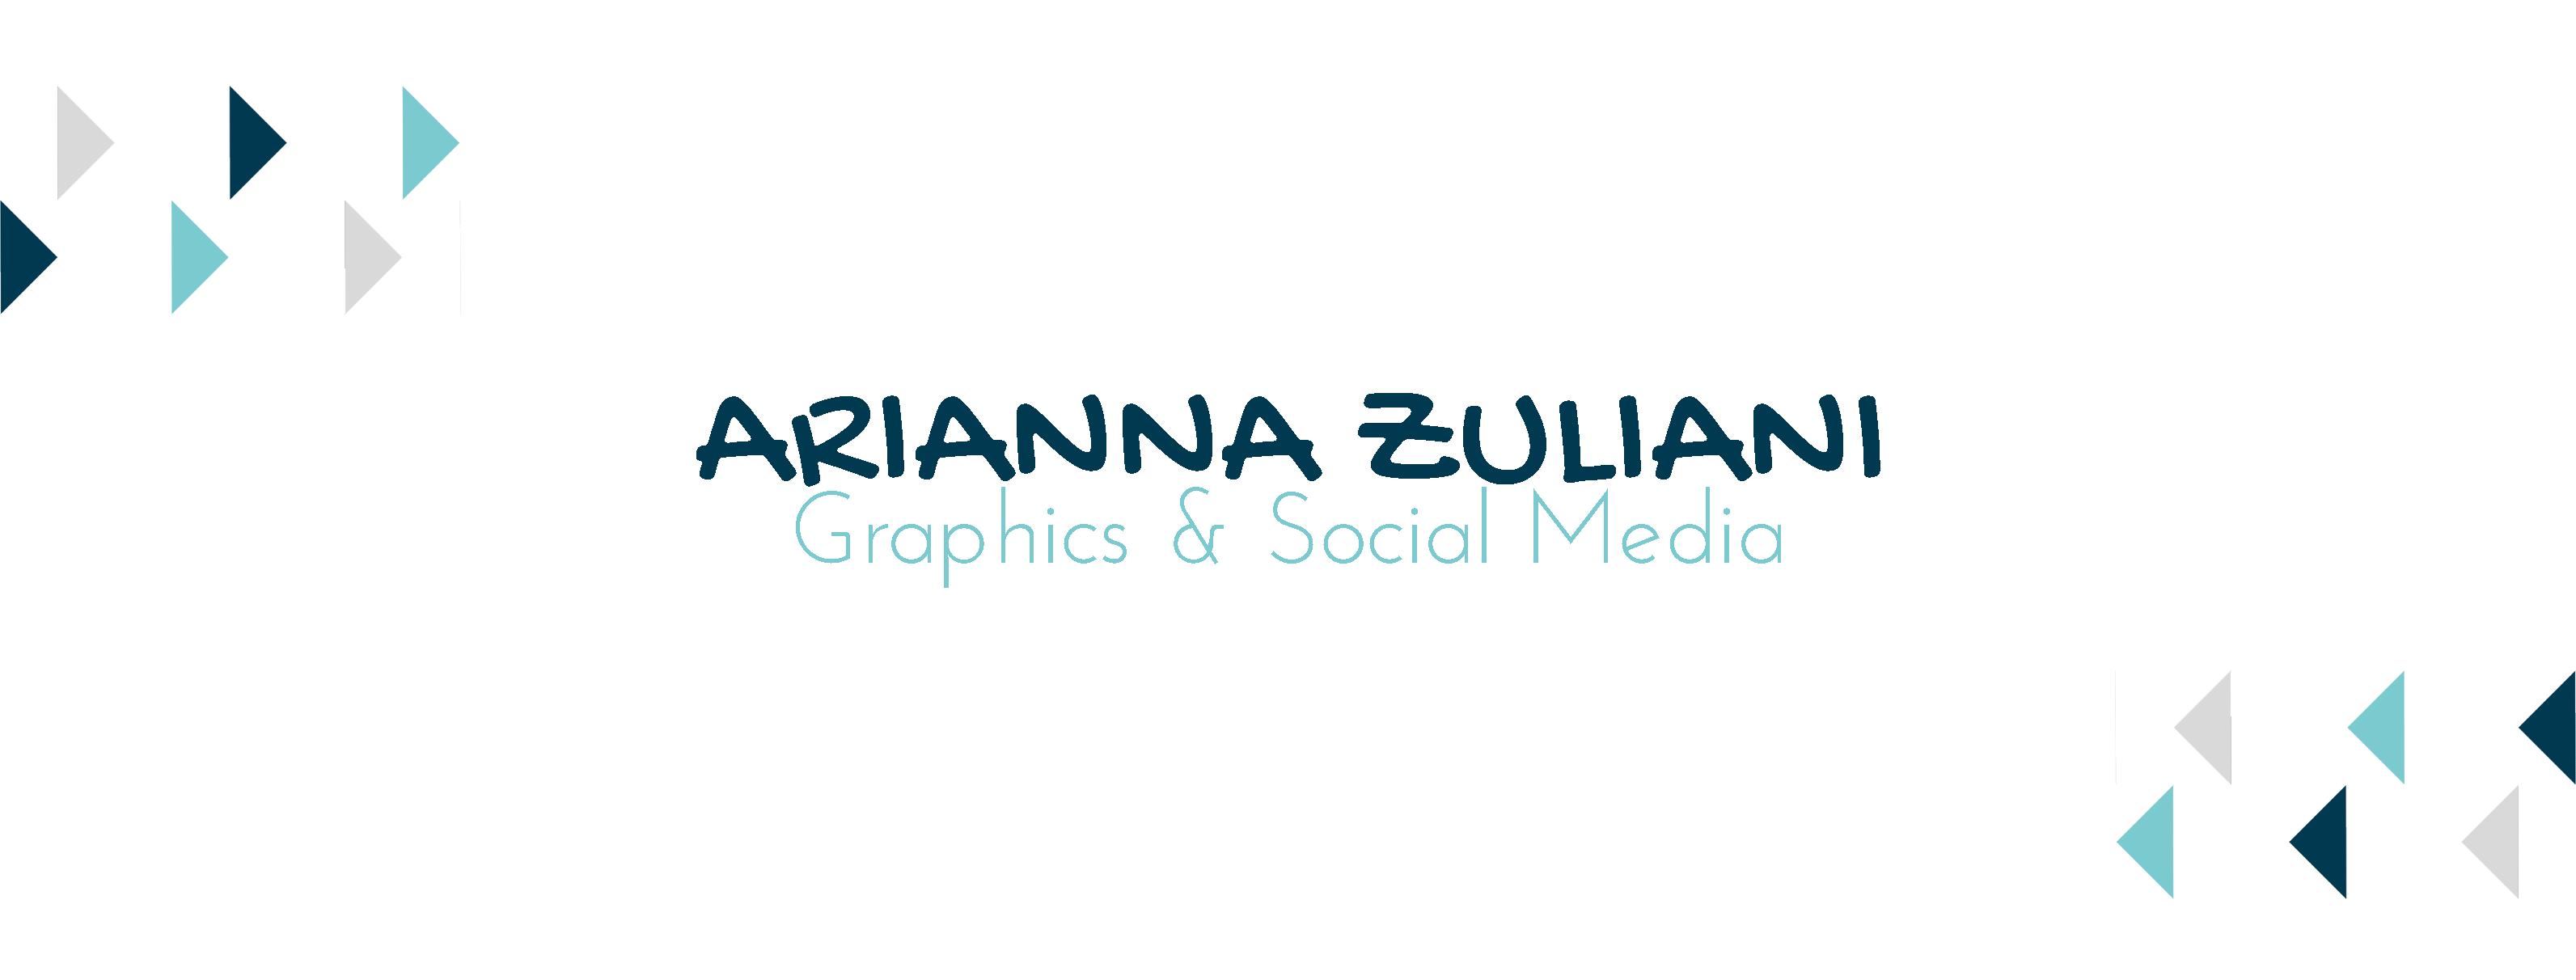 arianna zuliani, graphics, social media, graphics & social media